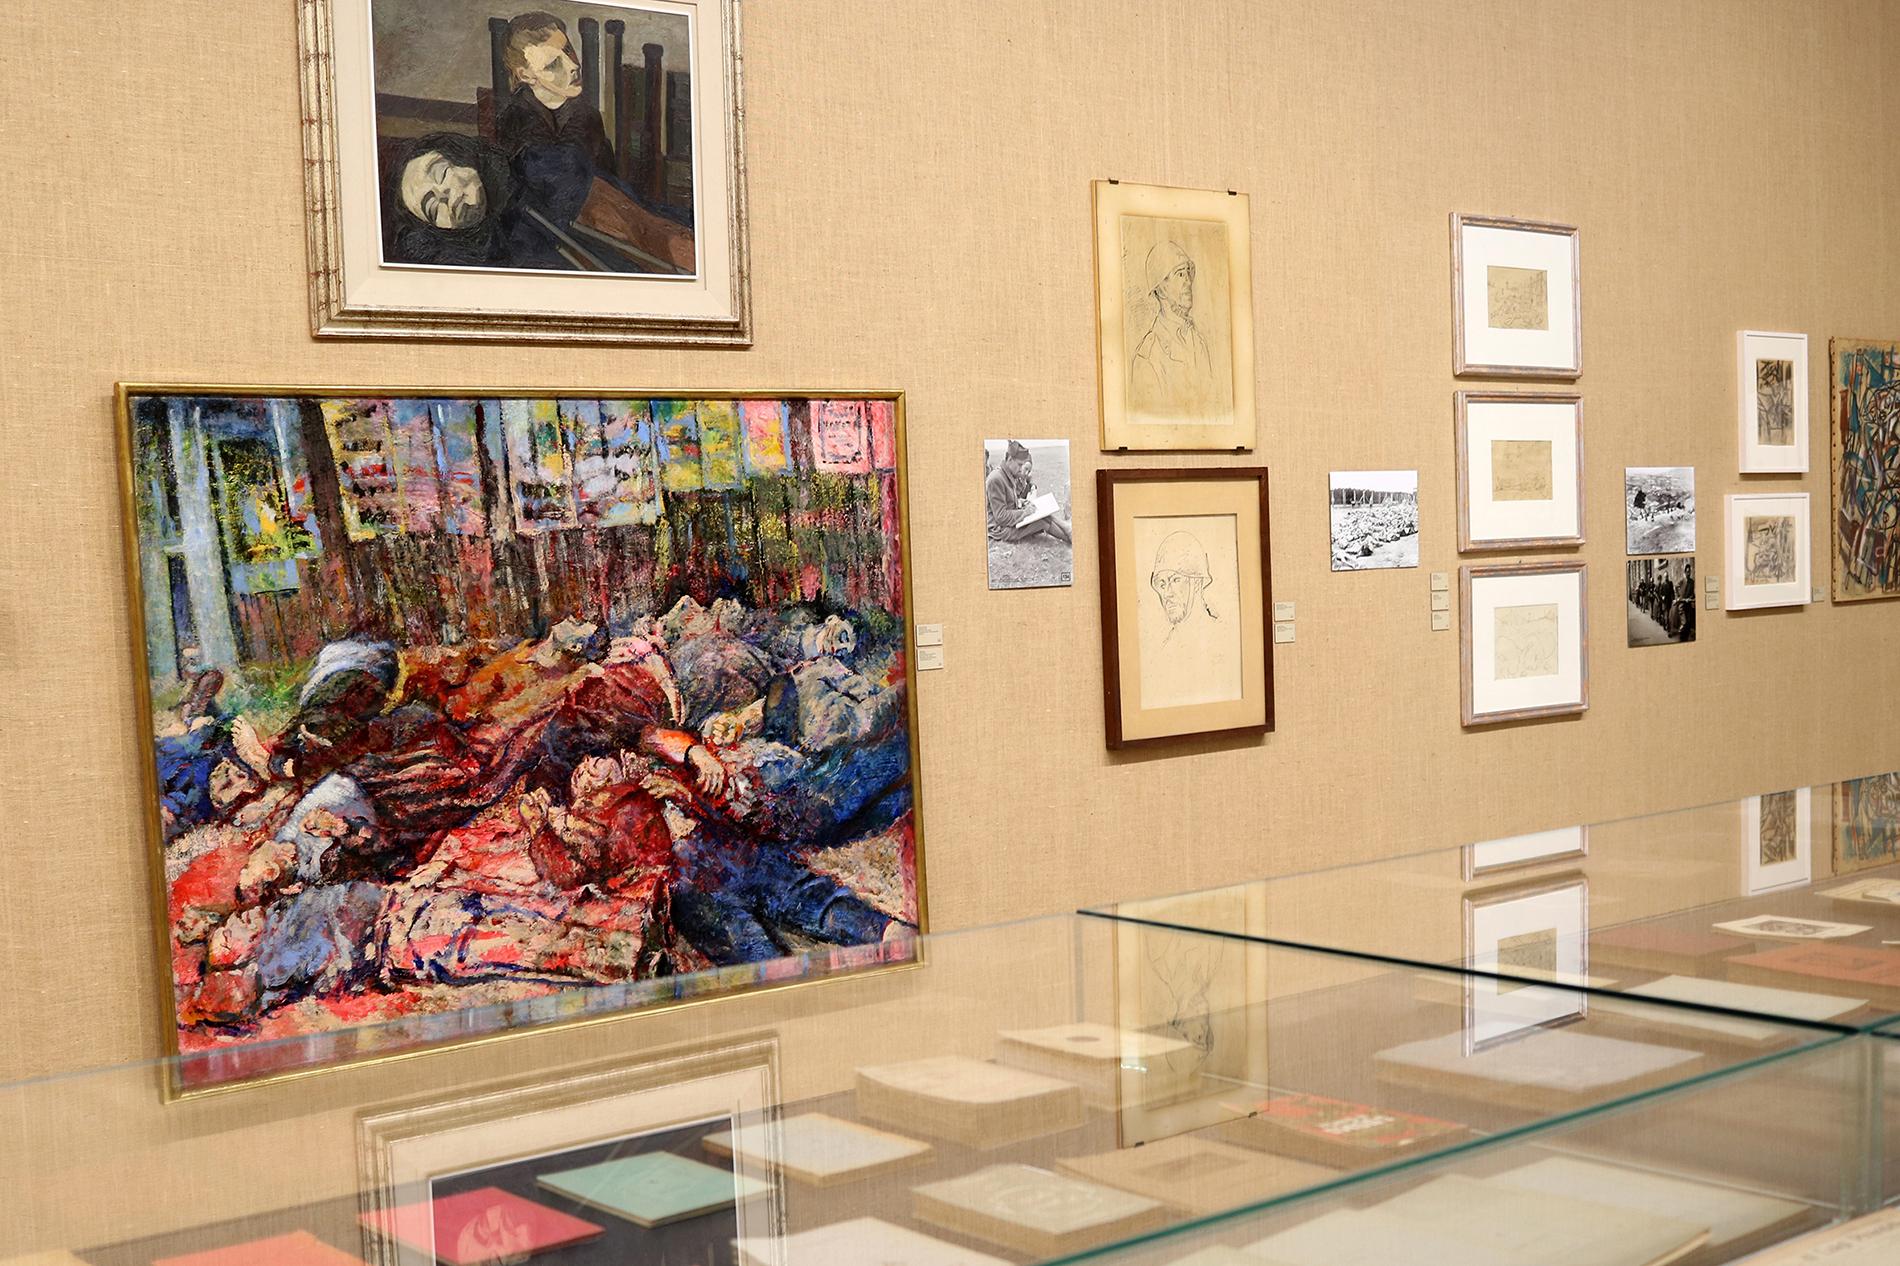 Ausstellungsansicht, Post Zang Tumb Tuuum. Art Life Politics: Italia 1918-1943 (Foto: Barbara Fässler), Fondazione Prada, Milano